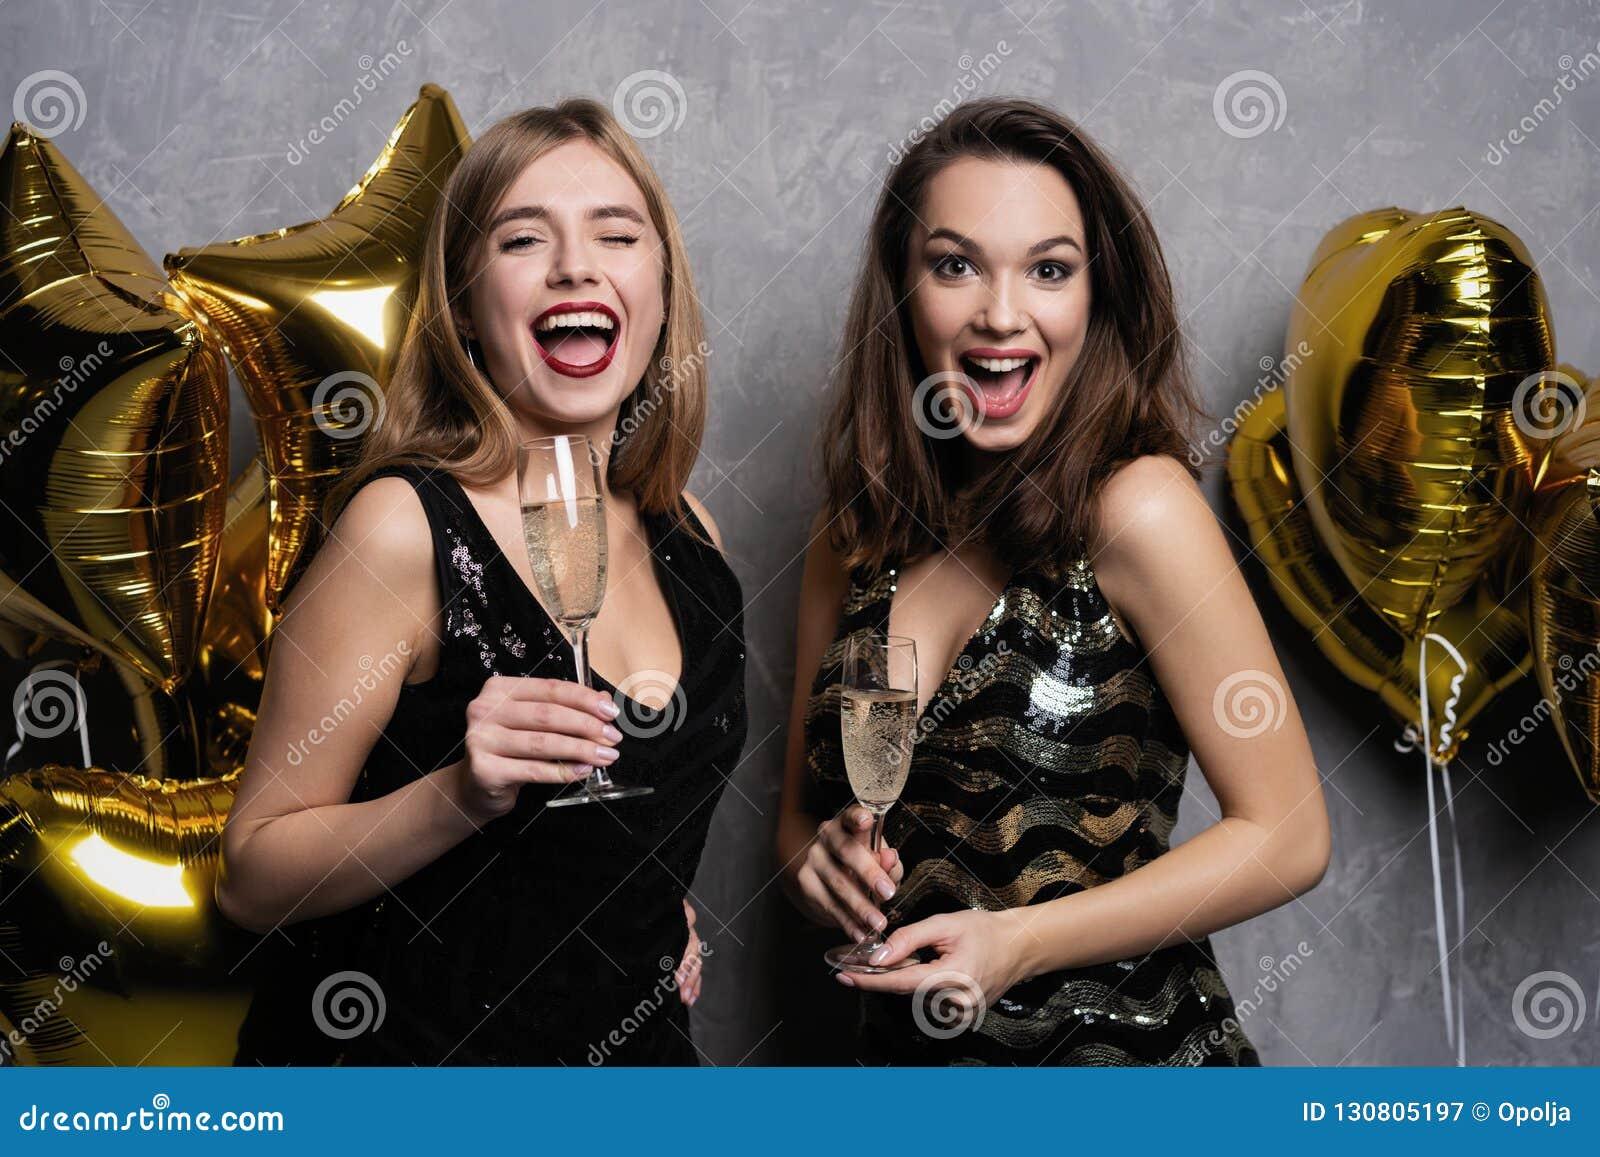 fdb15035677 Party Fun. Beautiful Girls Celebrating New Year. Portrait Of ...